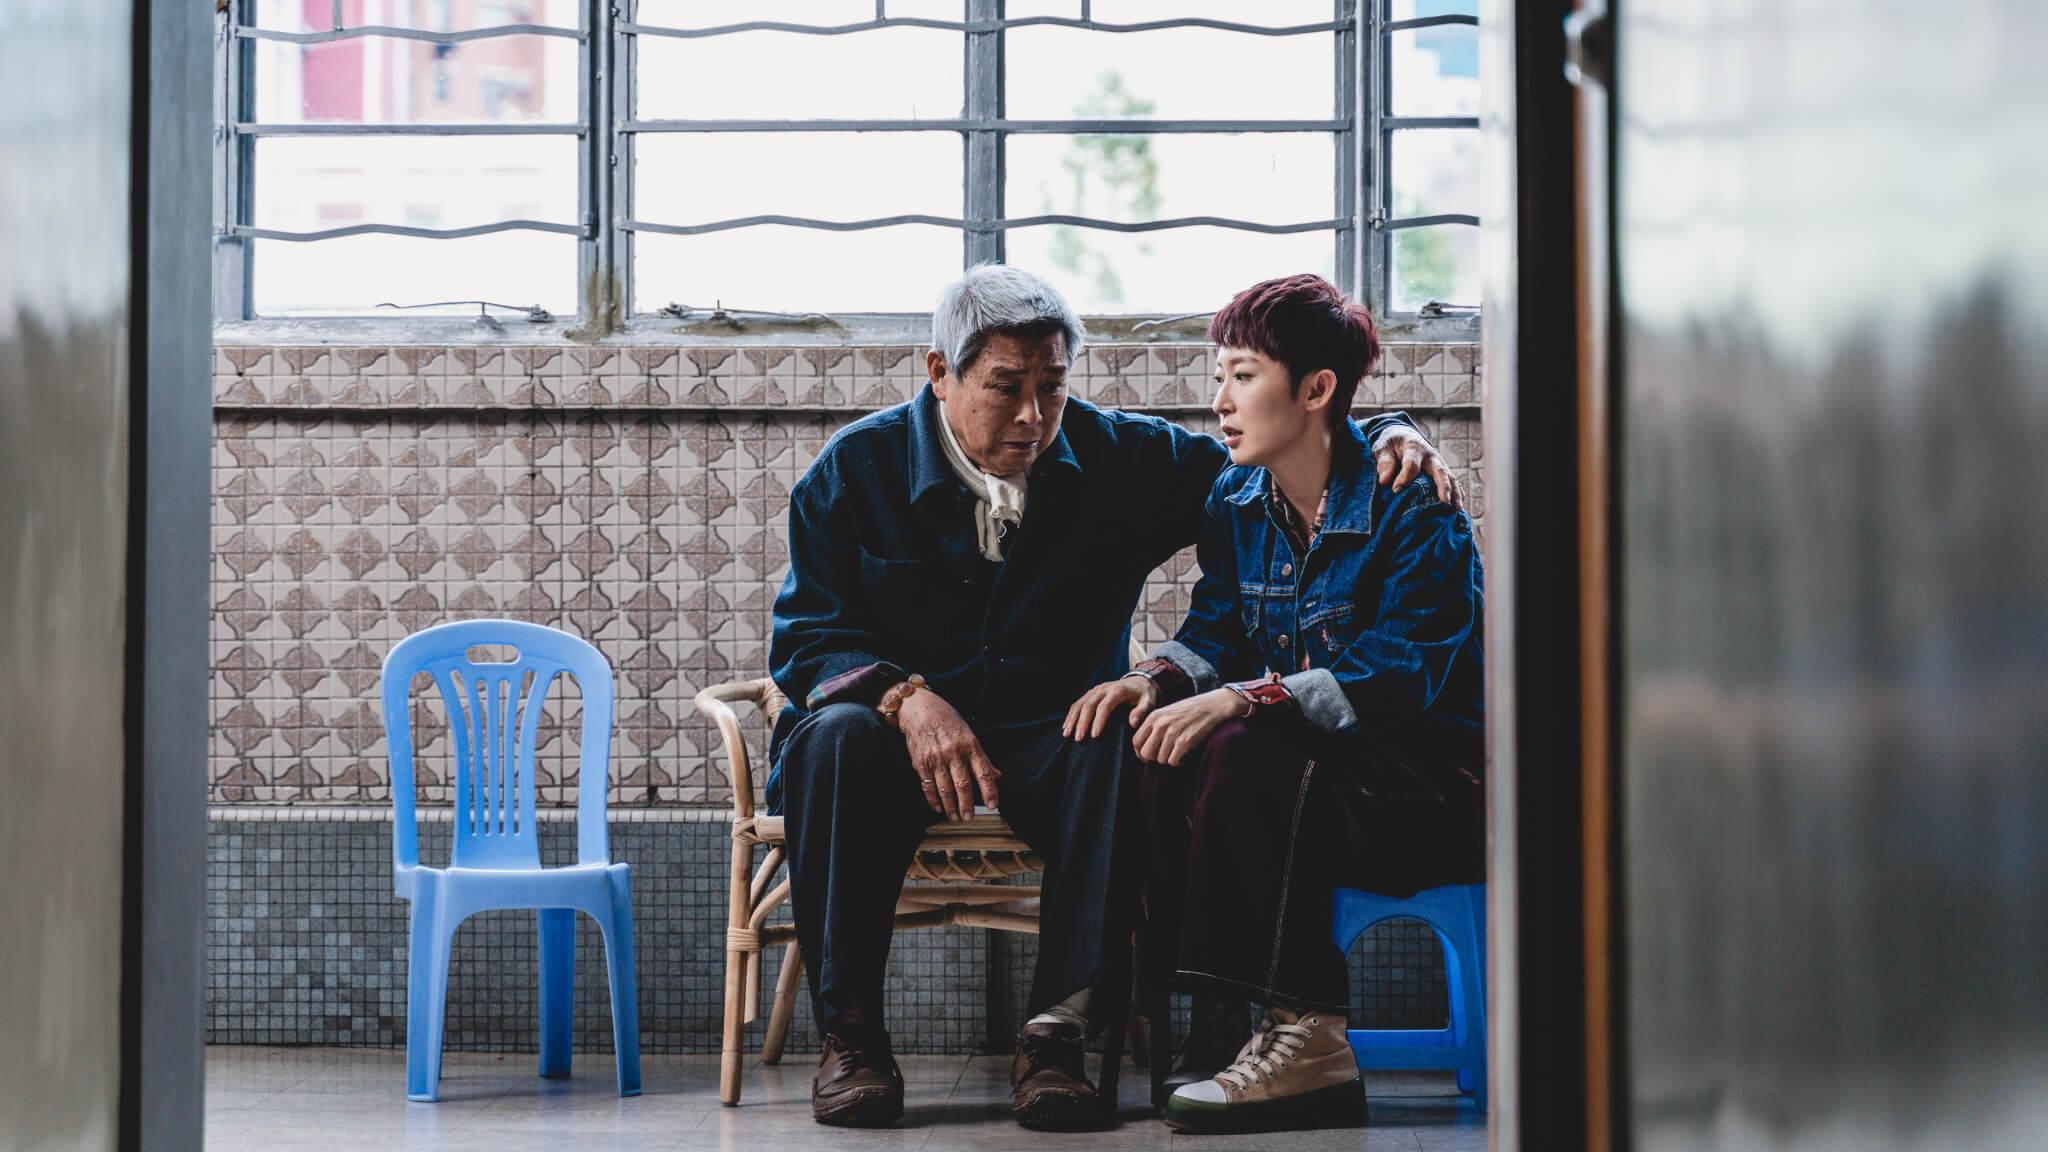 ViuTV劇集《歎息橋》剛播完,她在劇中因無家可歸到林保怡家暫住,劉兆銘飾演保怡父親。